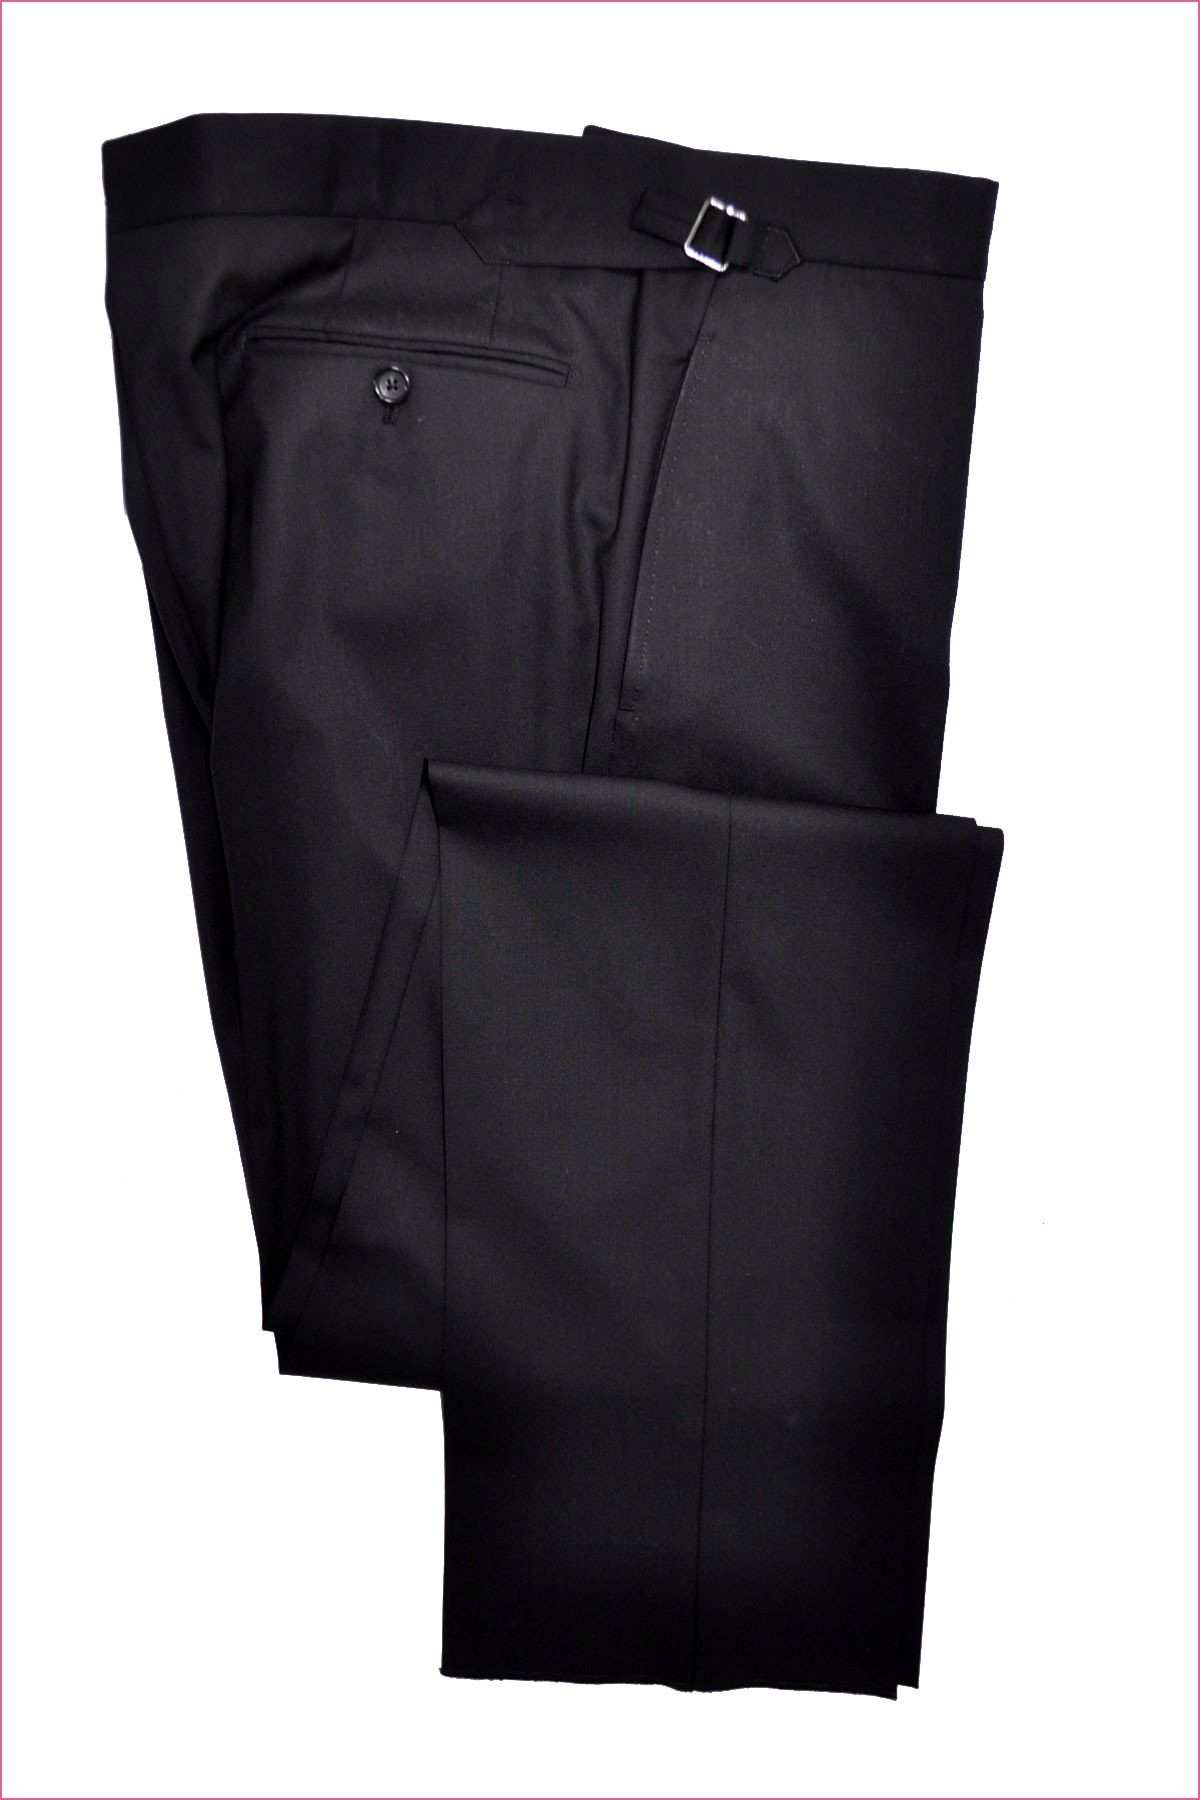 Harvey Specter Anzug Tom Ford Suit Suits Episodes Suits